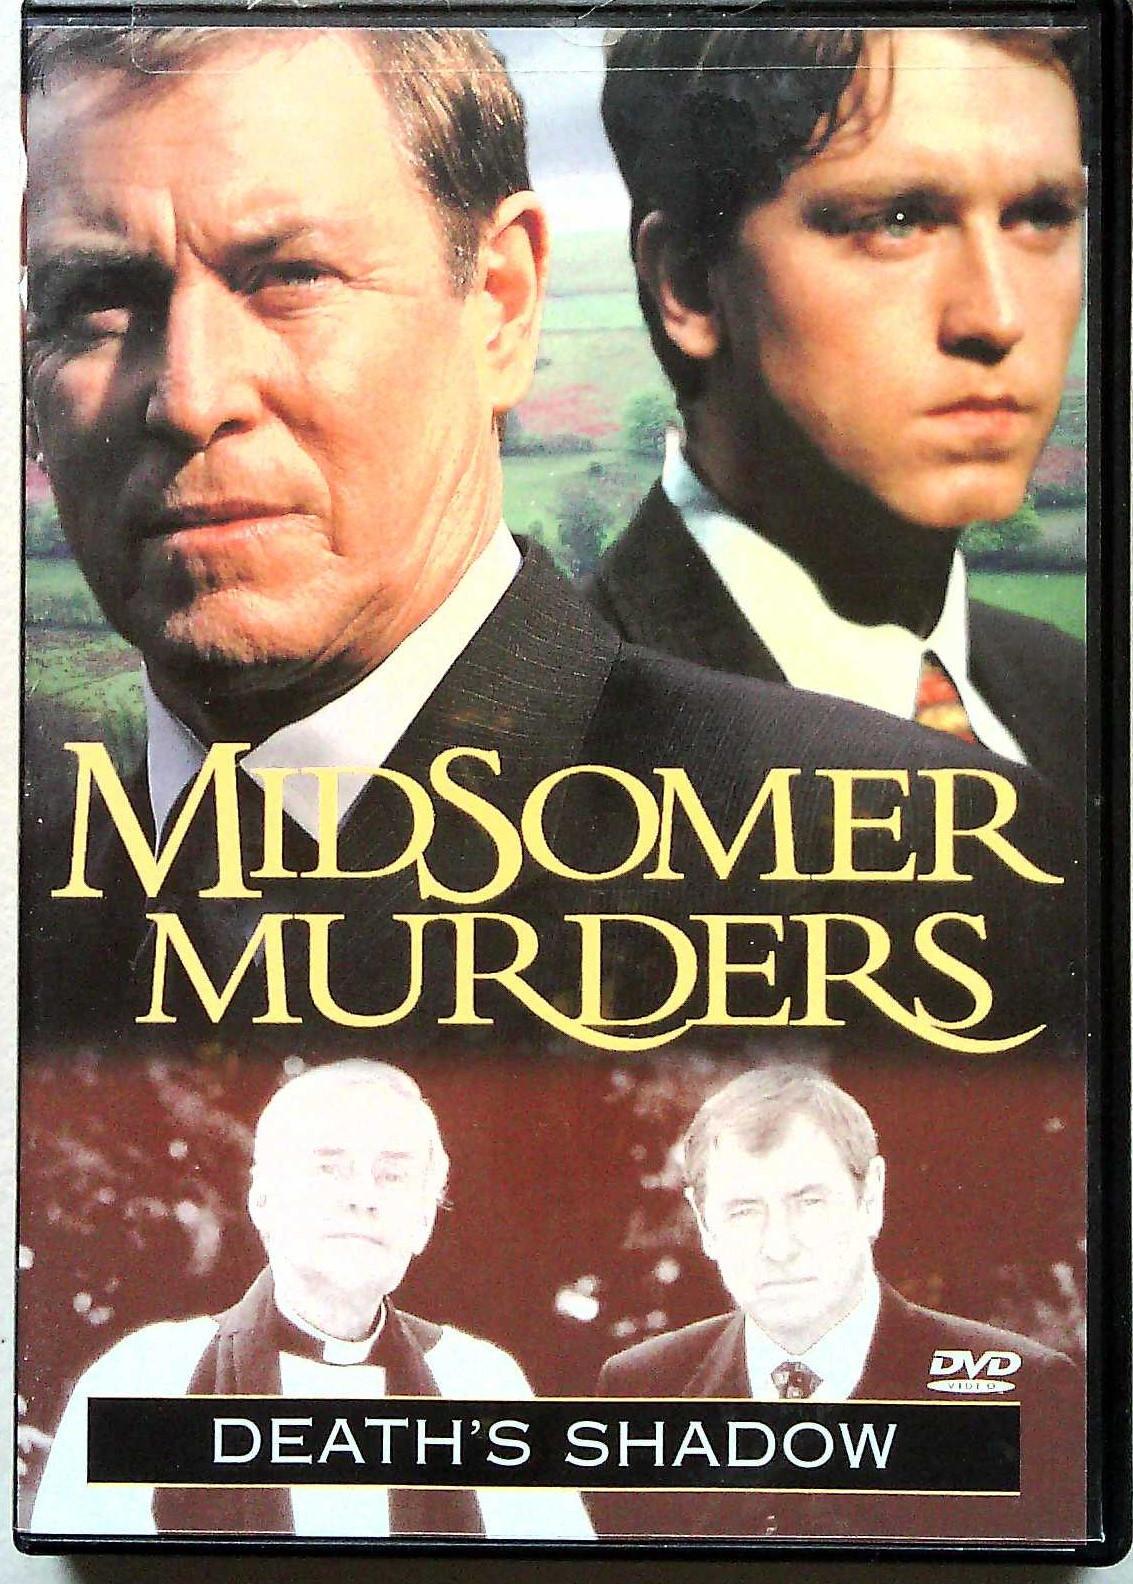 midsomer murders death's shadow | etsy